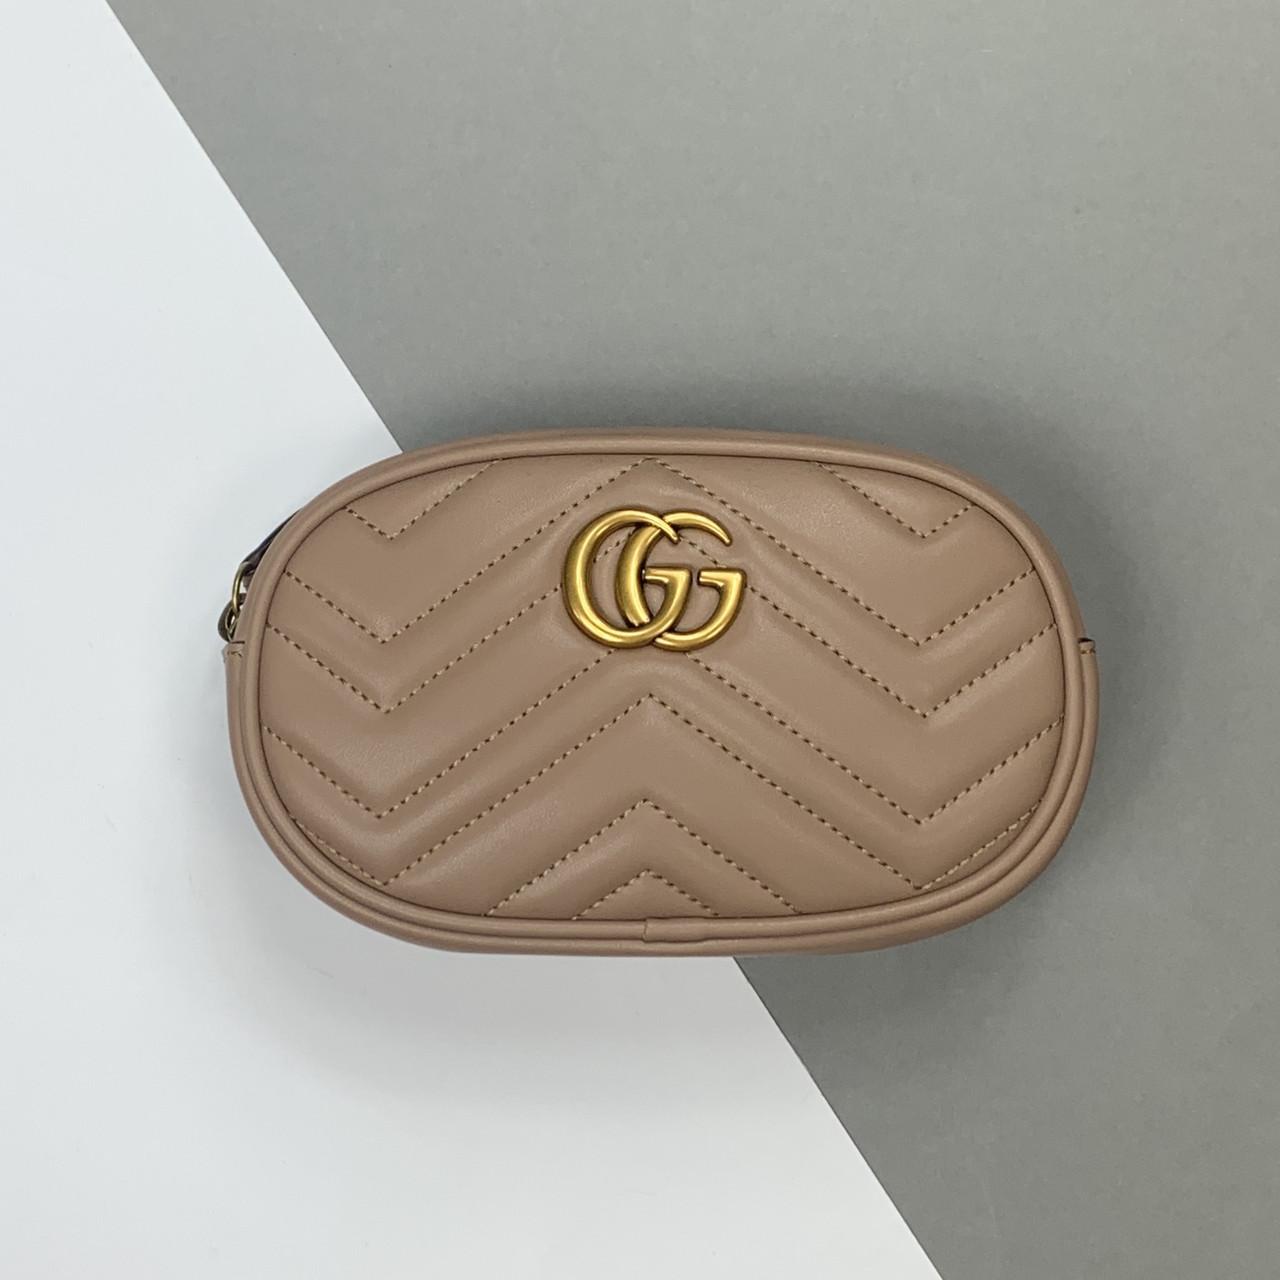 Поясная сумка GG Marmont Gucci 9А (Гуччи) арт. 04-16